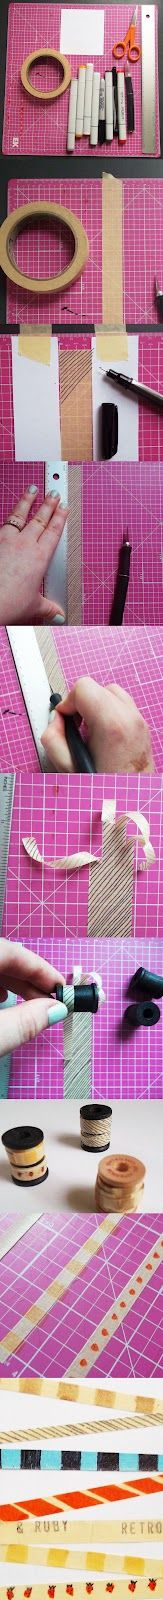 Retro and Ruby: Handmade Washi Tape Tutorial